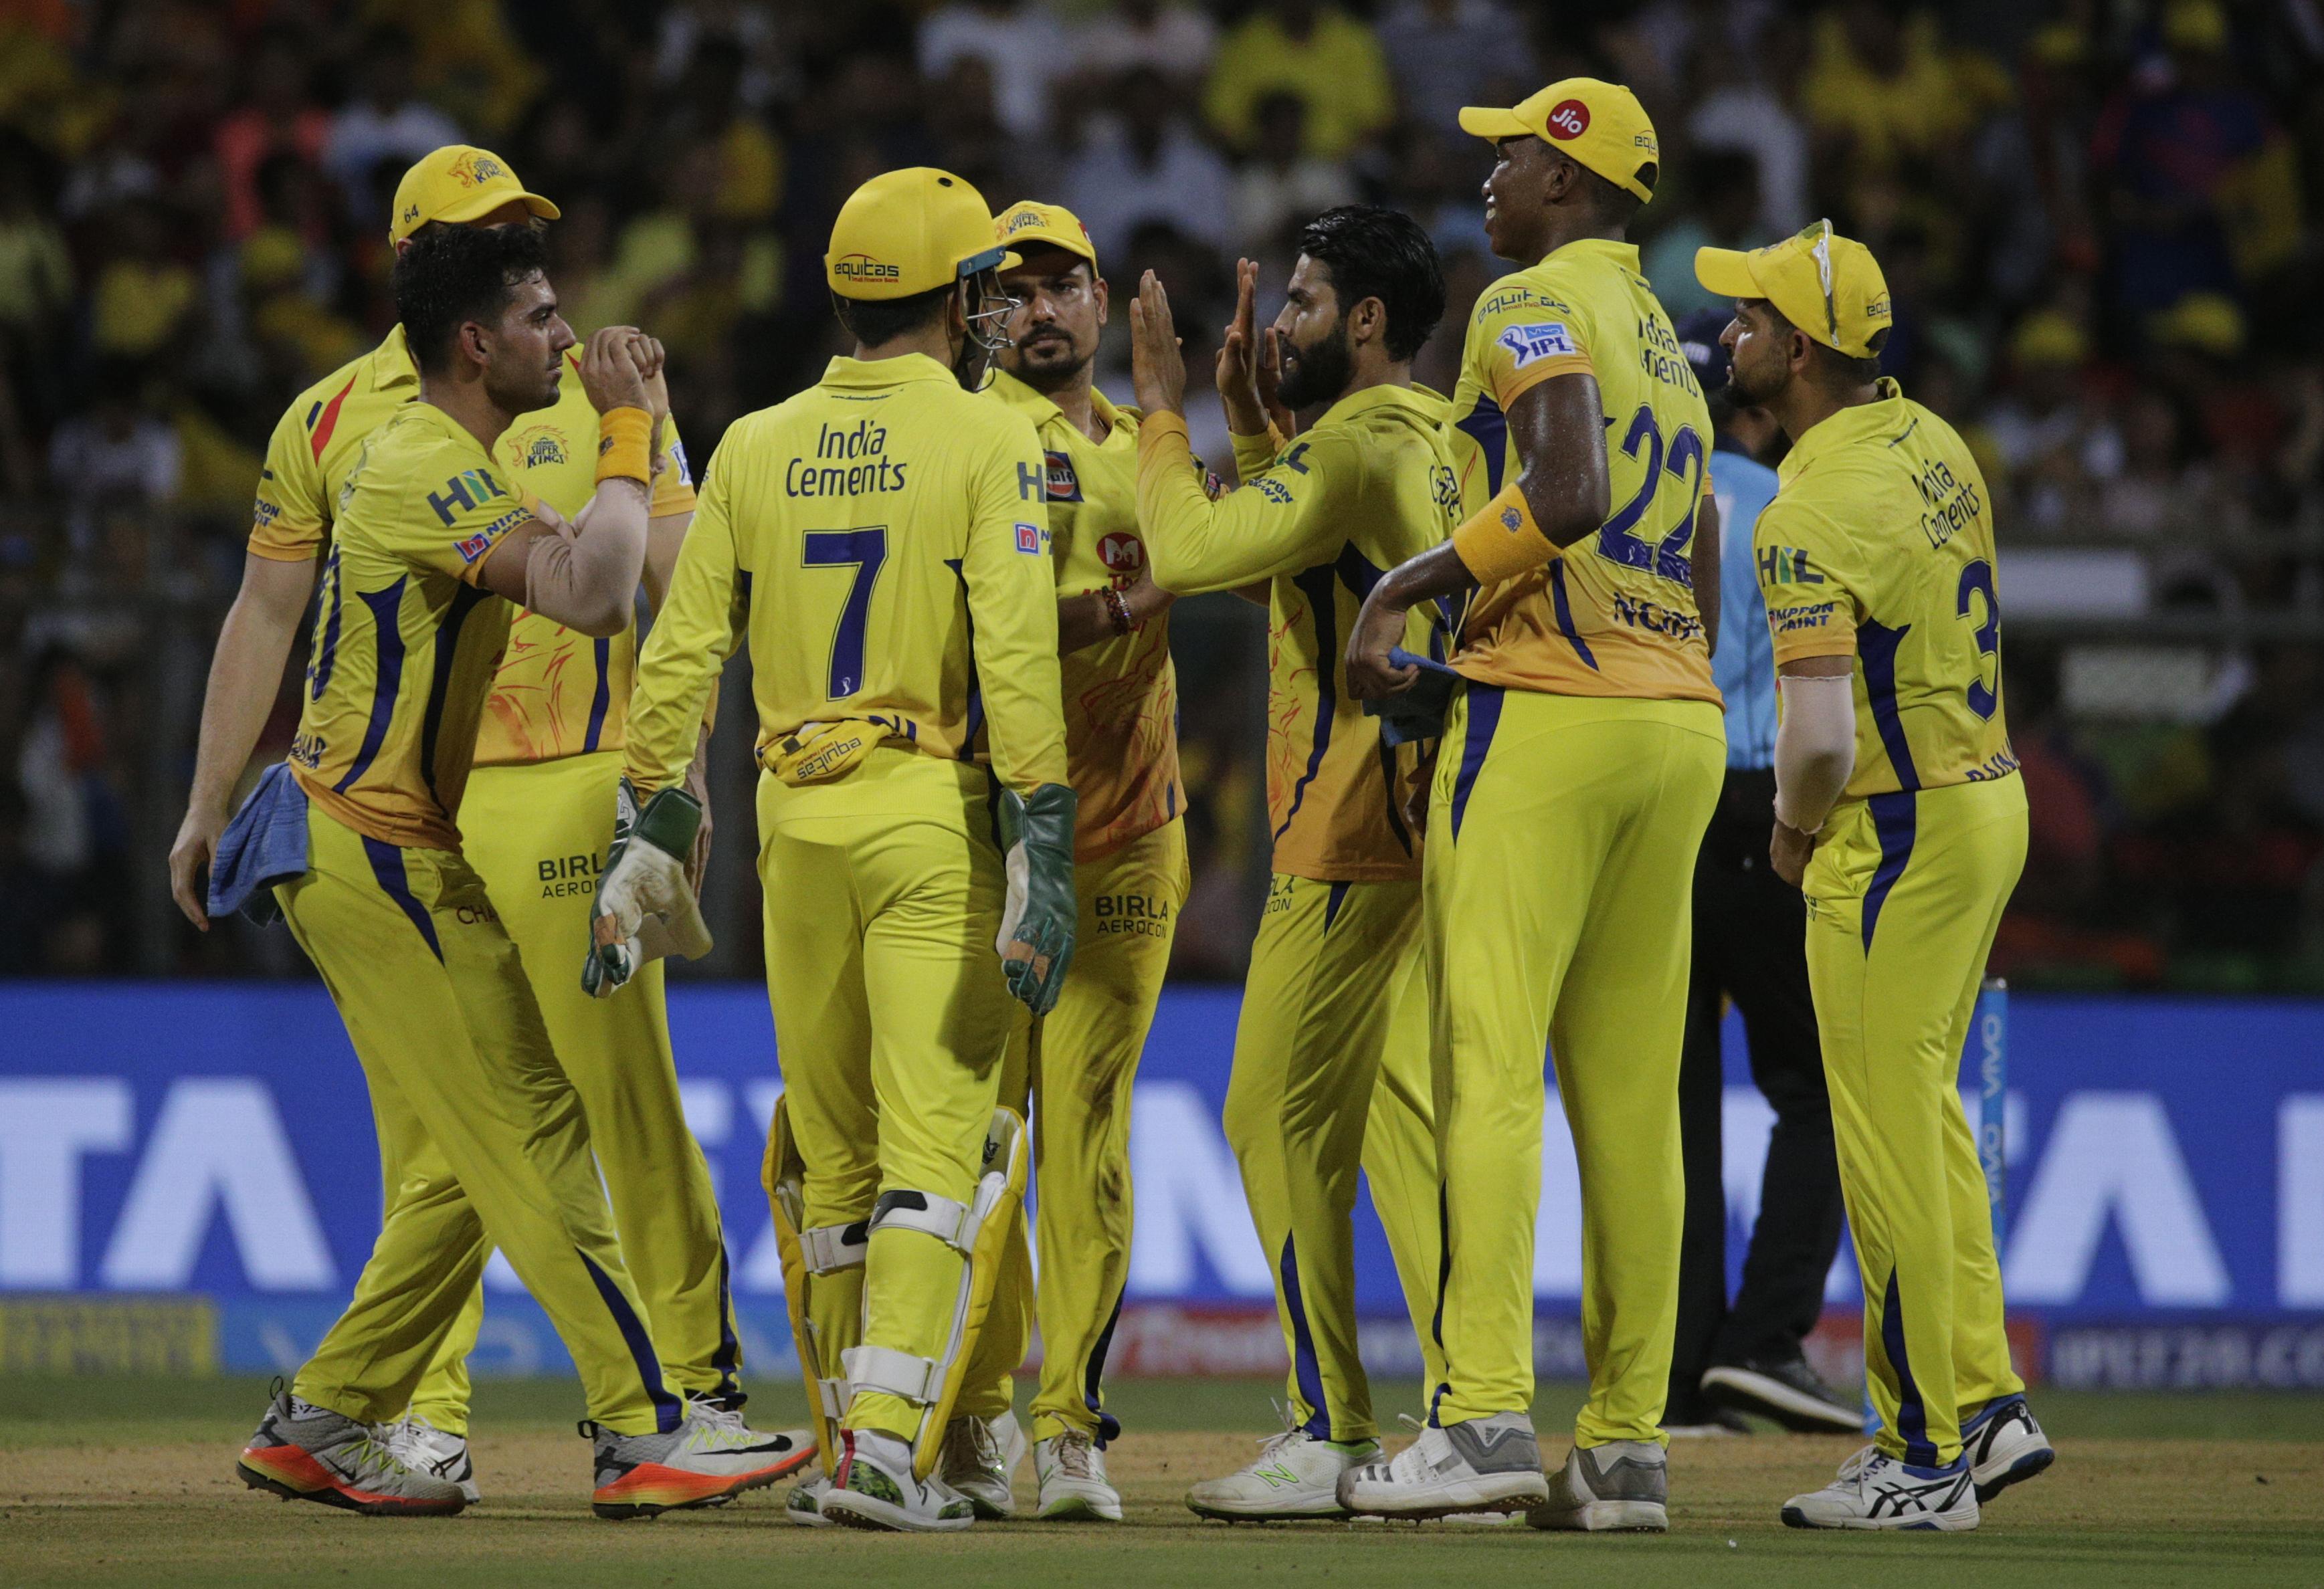 CSK clinched their third IPL title - their first triumph since 2011